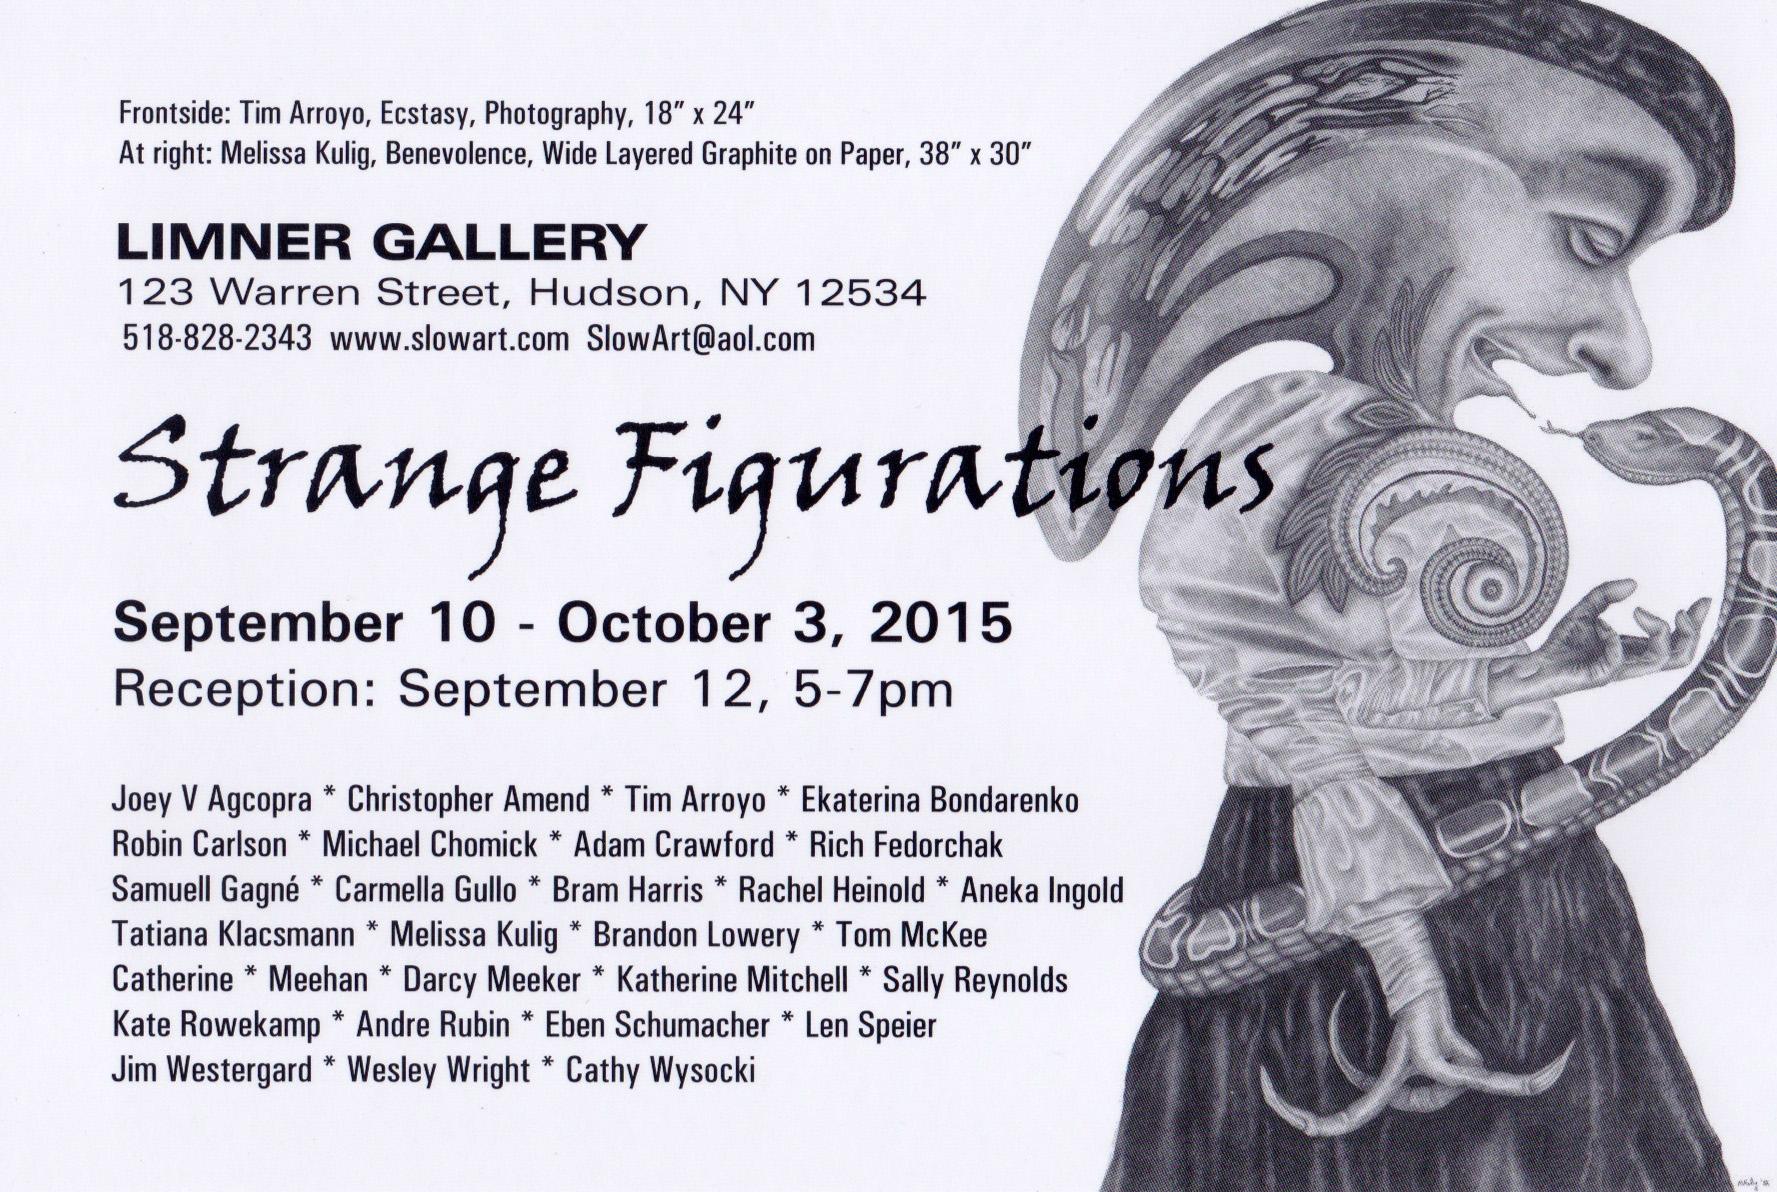 Strange Figurations  Reception: Saturday, September 12, 5-7 pm  September 10 - October 3, 2015  Limner Gallery  123 Warren Street  Hudson, NY 12534